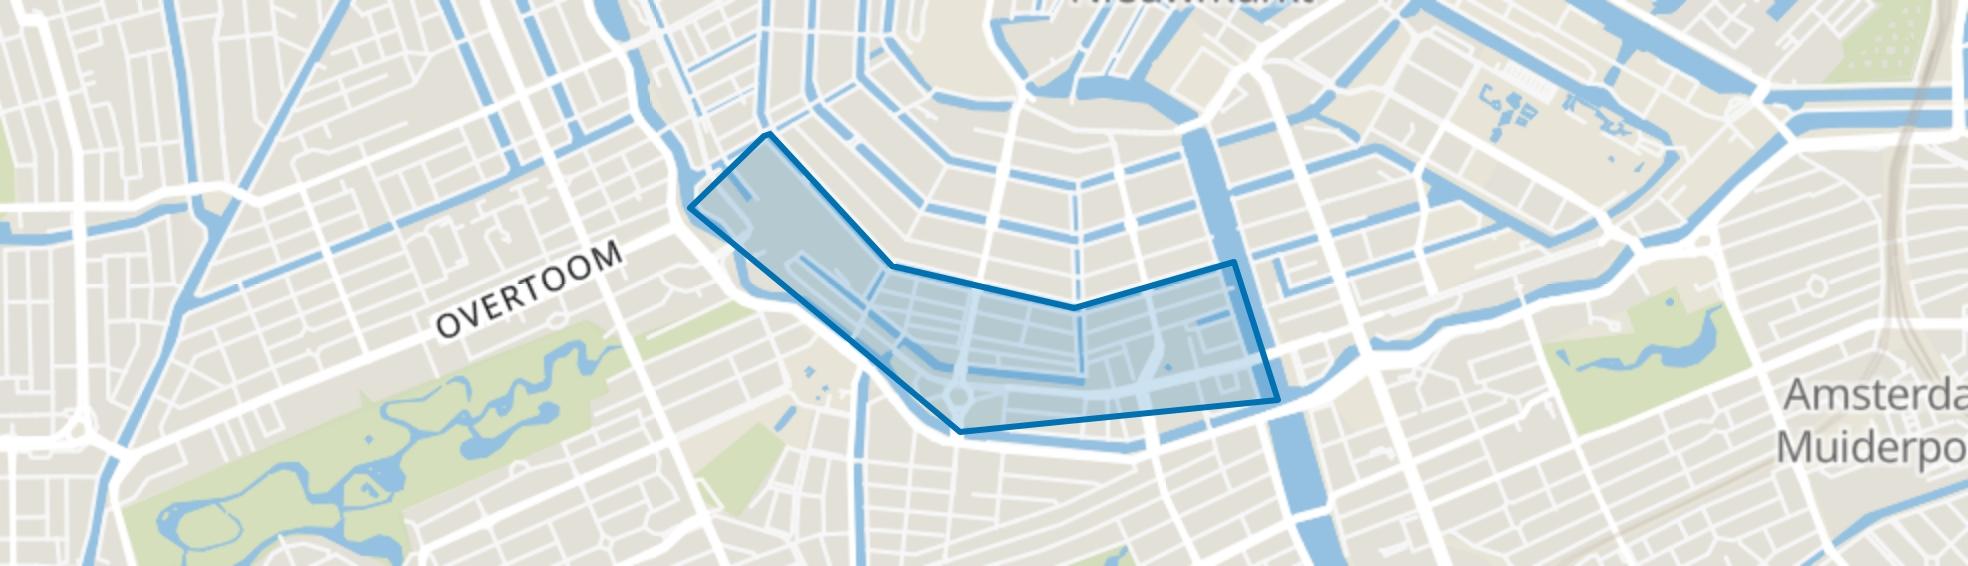 De Weteringschans, Amsterdam map